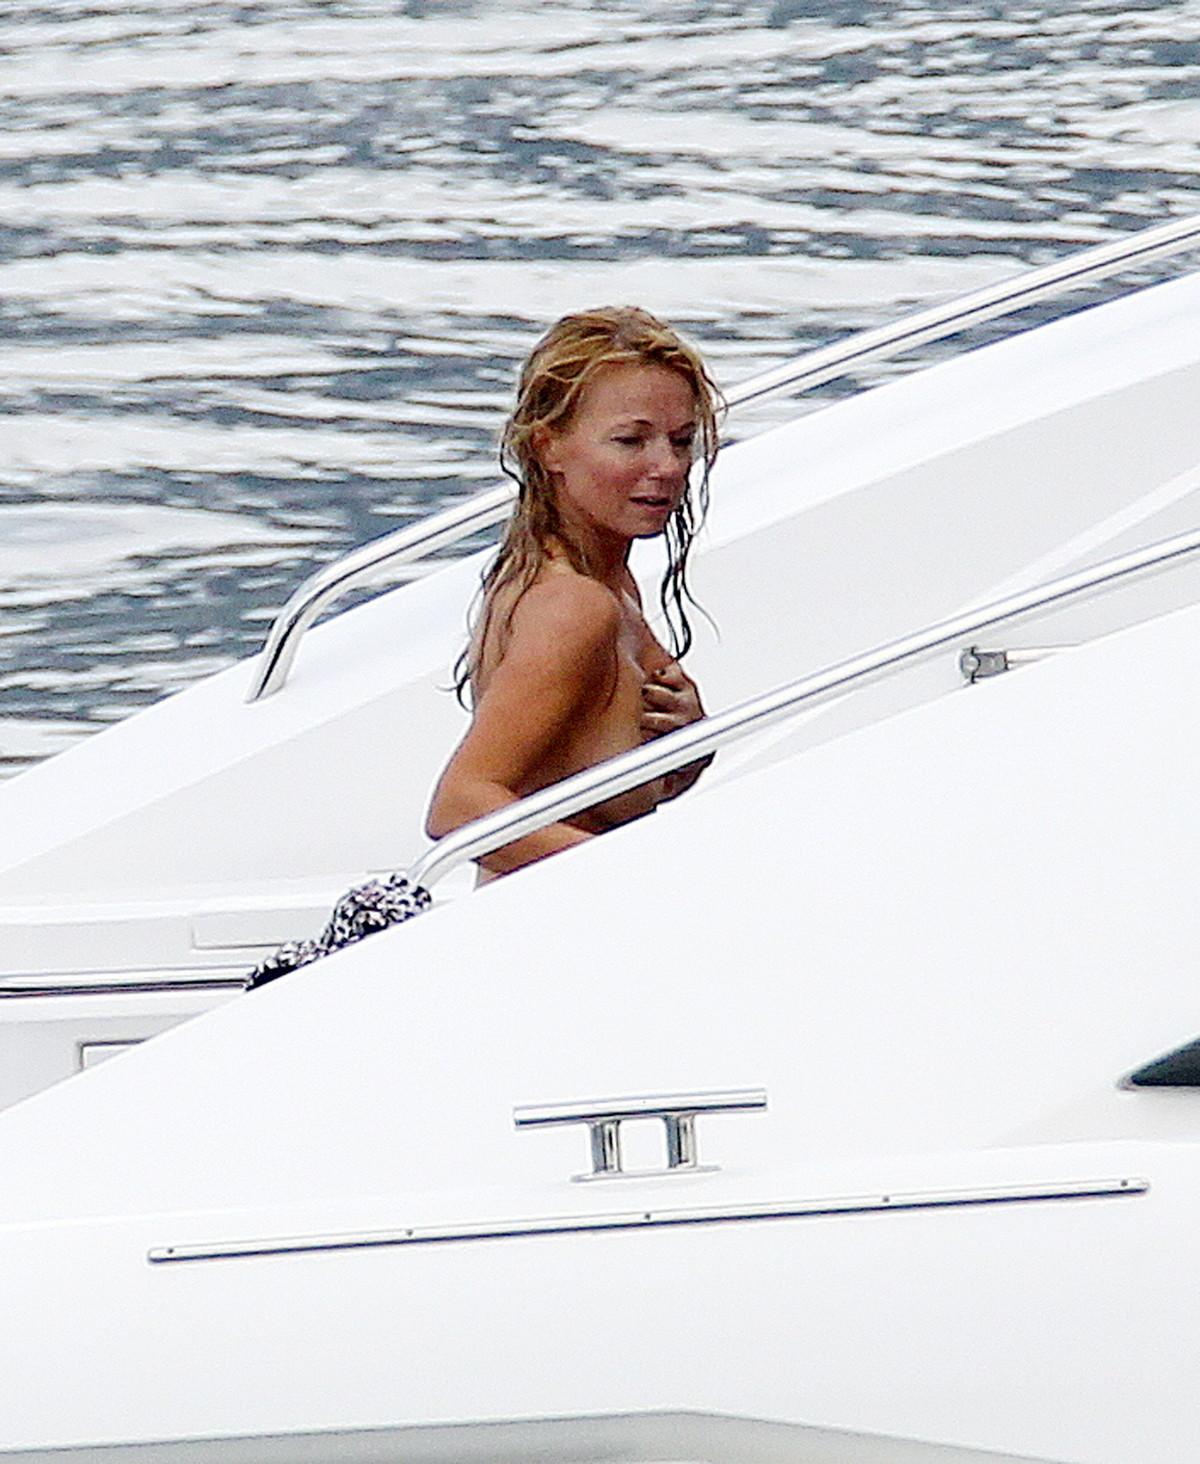 http://4.bp.blogspot.com/-3ALt1vq7xus/TgTRmUsqO7I/AAAAAAAADMI/1LdE-wmFgbE/s1600/Geri+Halliwell+Topless+Bikini+Candids+On+A+Boat+www.GutterUncensoredPlus.com+003.jpg